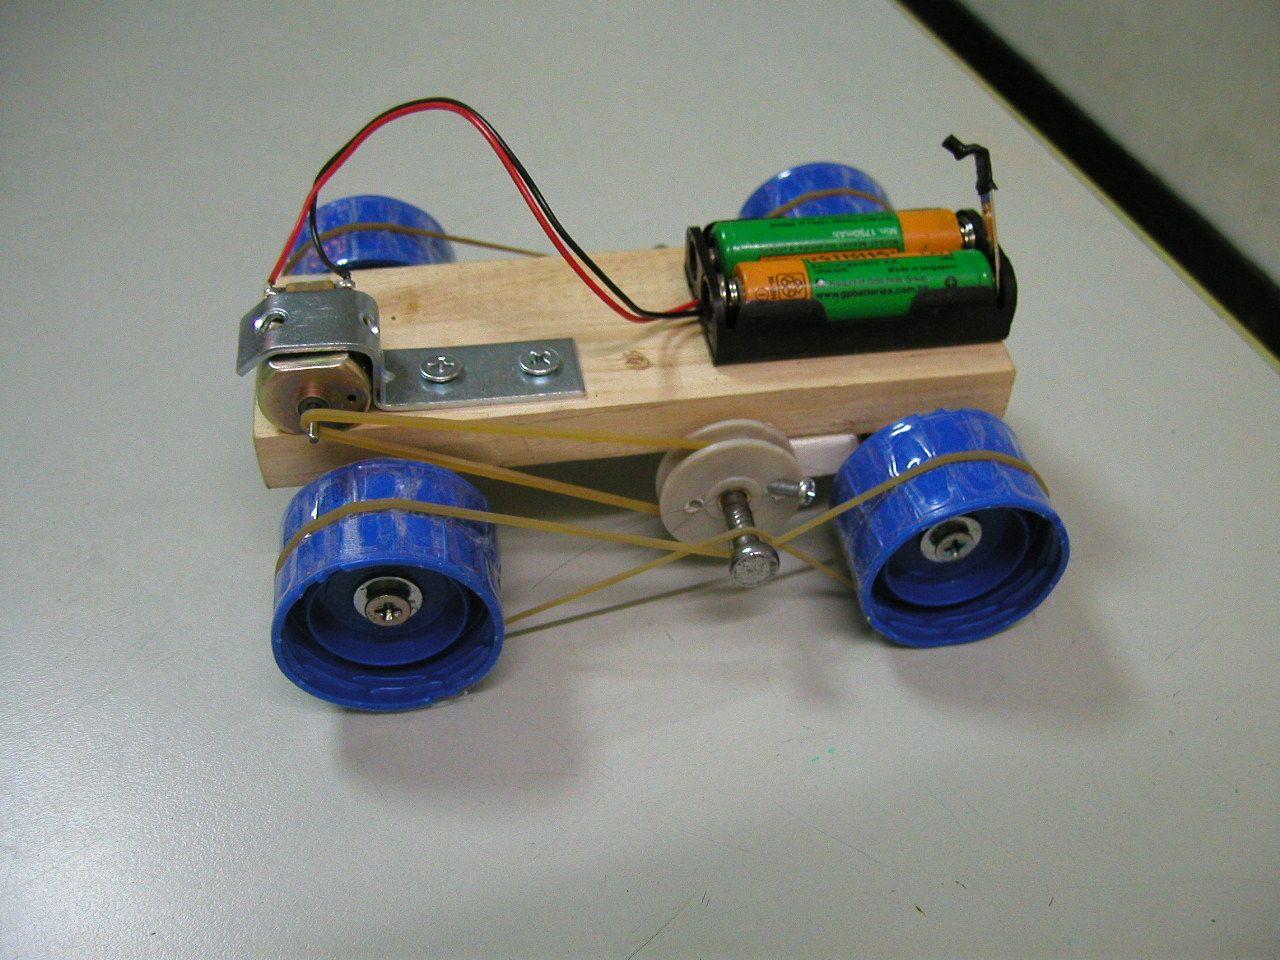 toy electric car design google search engineering design pinterest. Black Bedroom Furniture Sets. Home Design Ideas